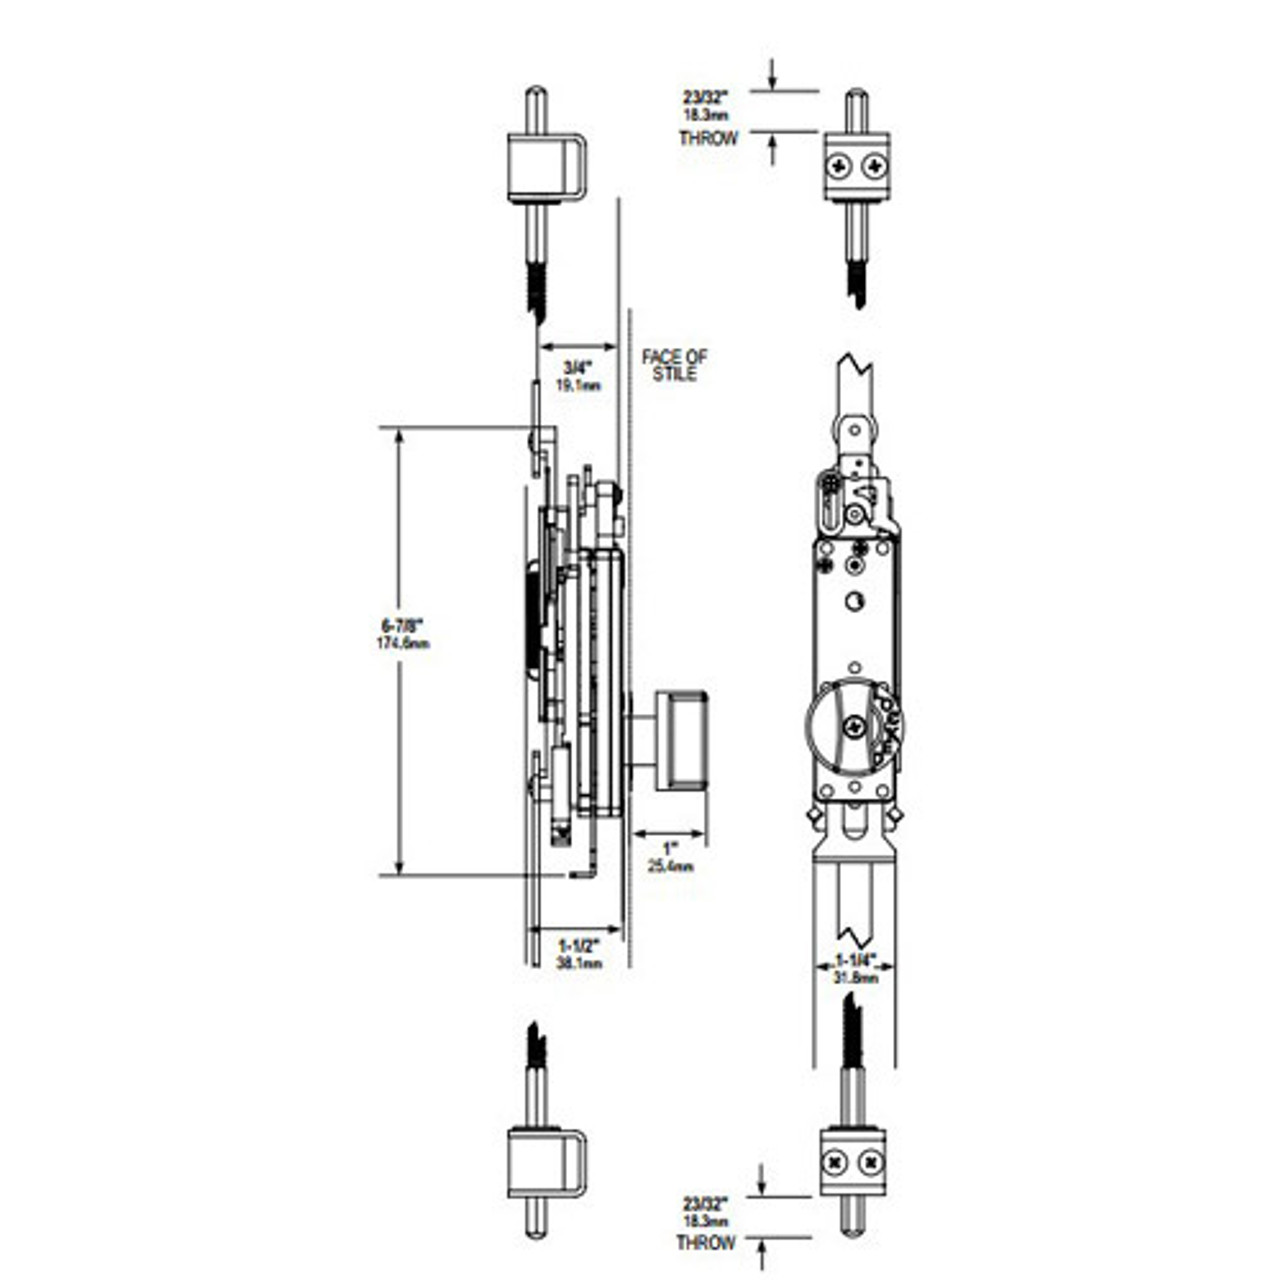 MS2180-07-119 Adams Rite Flushbolt Dimensional View